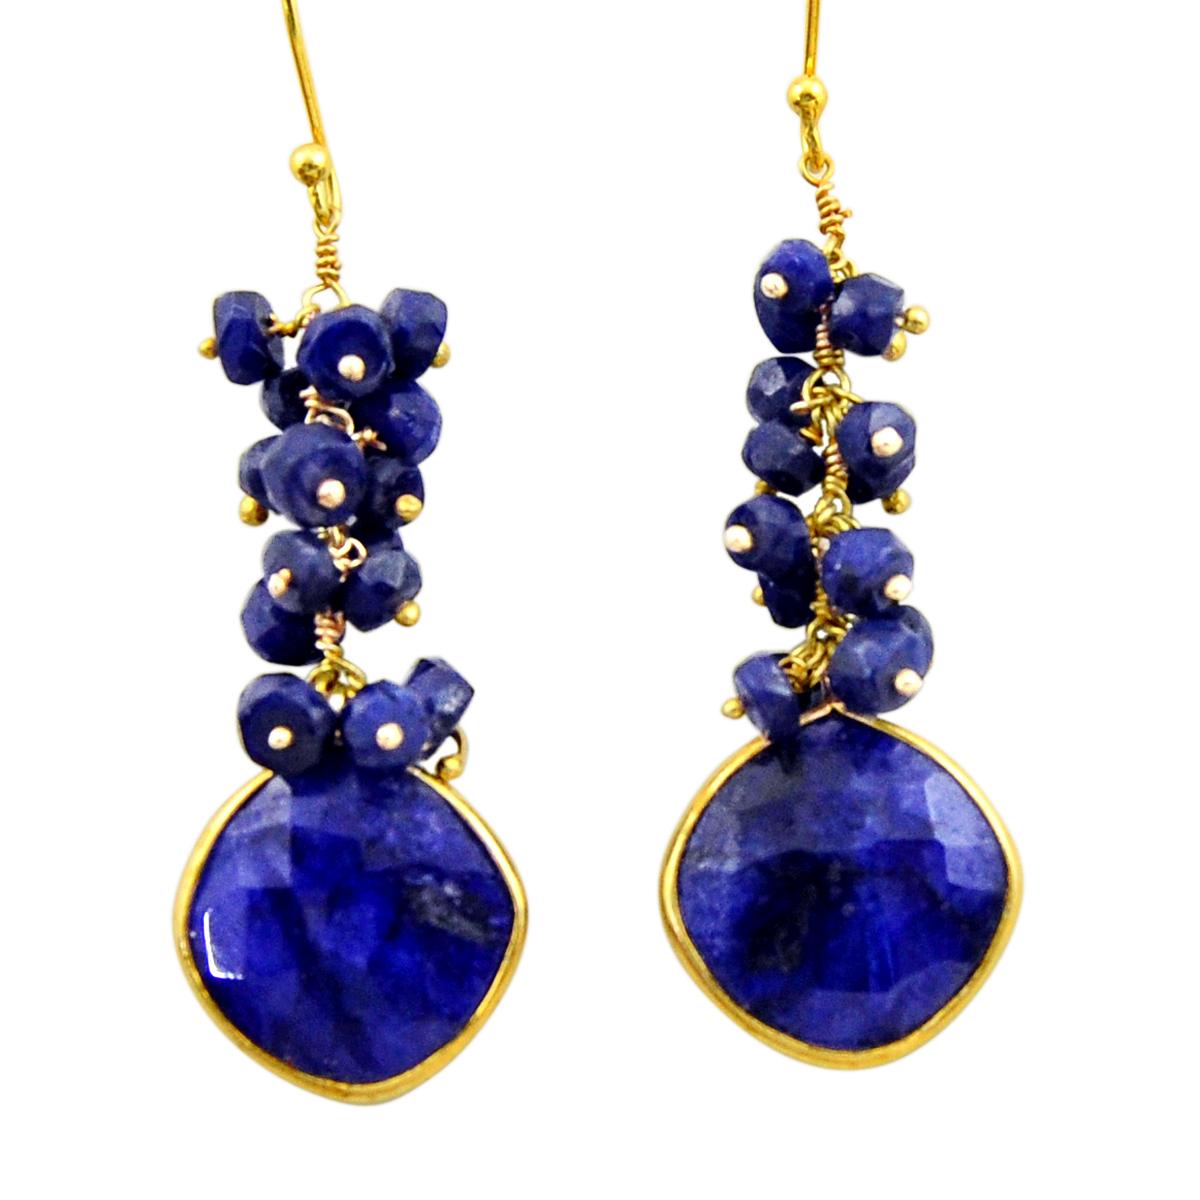 A pair of 925 silver gilt drop earrings set with lapis lazuli, L. 5.5cm.